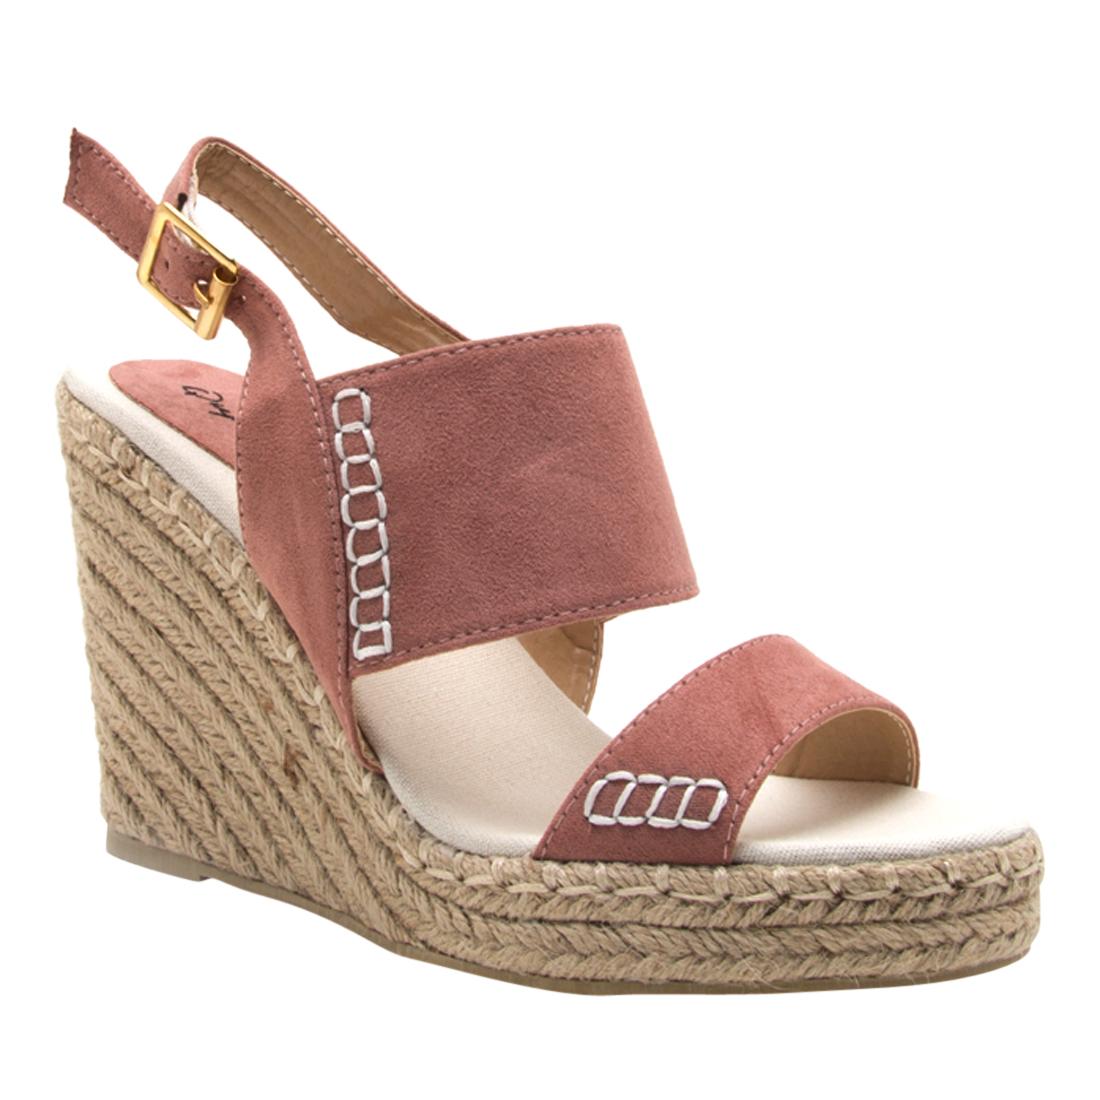 2c2dbe1203b QUPID FG61 Women's Slingback Stitched Espadrille Platform Wedge Sandals